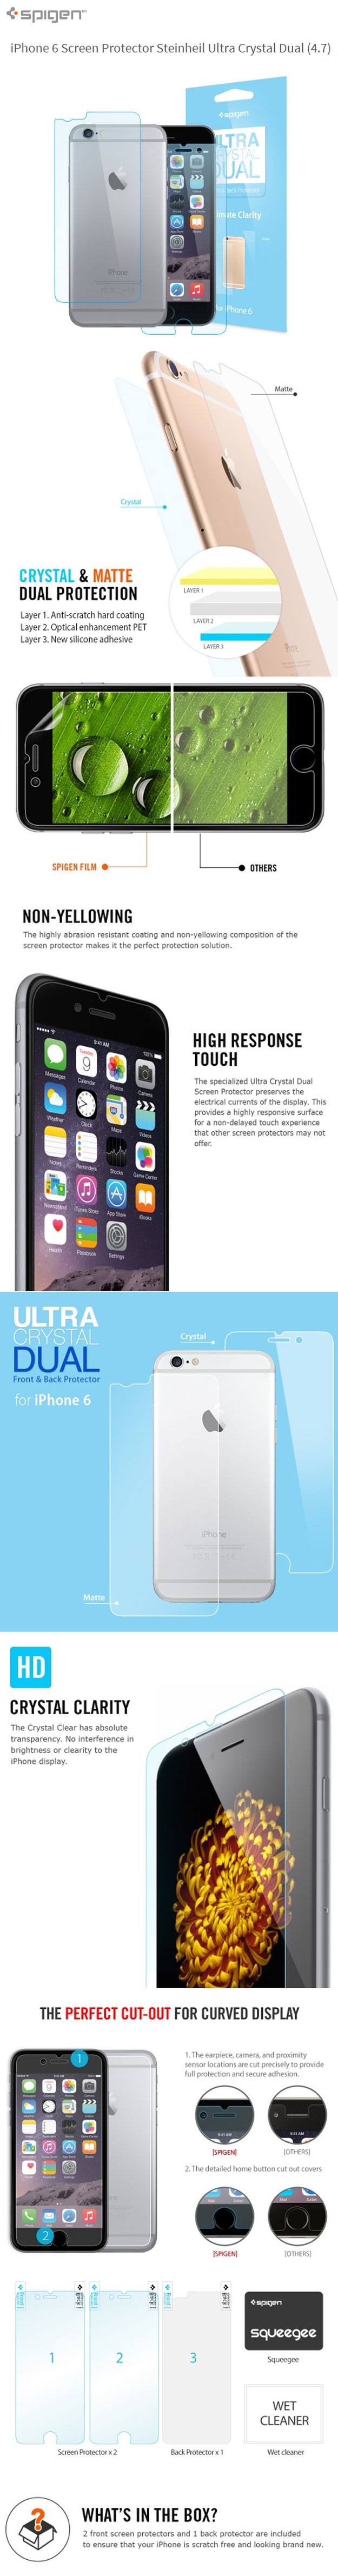 iPhone6ScreenProtectorSteinheilUltraCrystalDual4.7